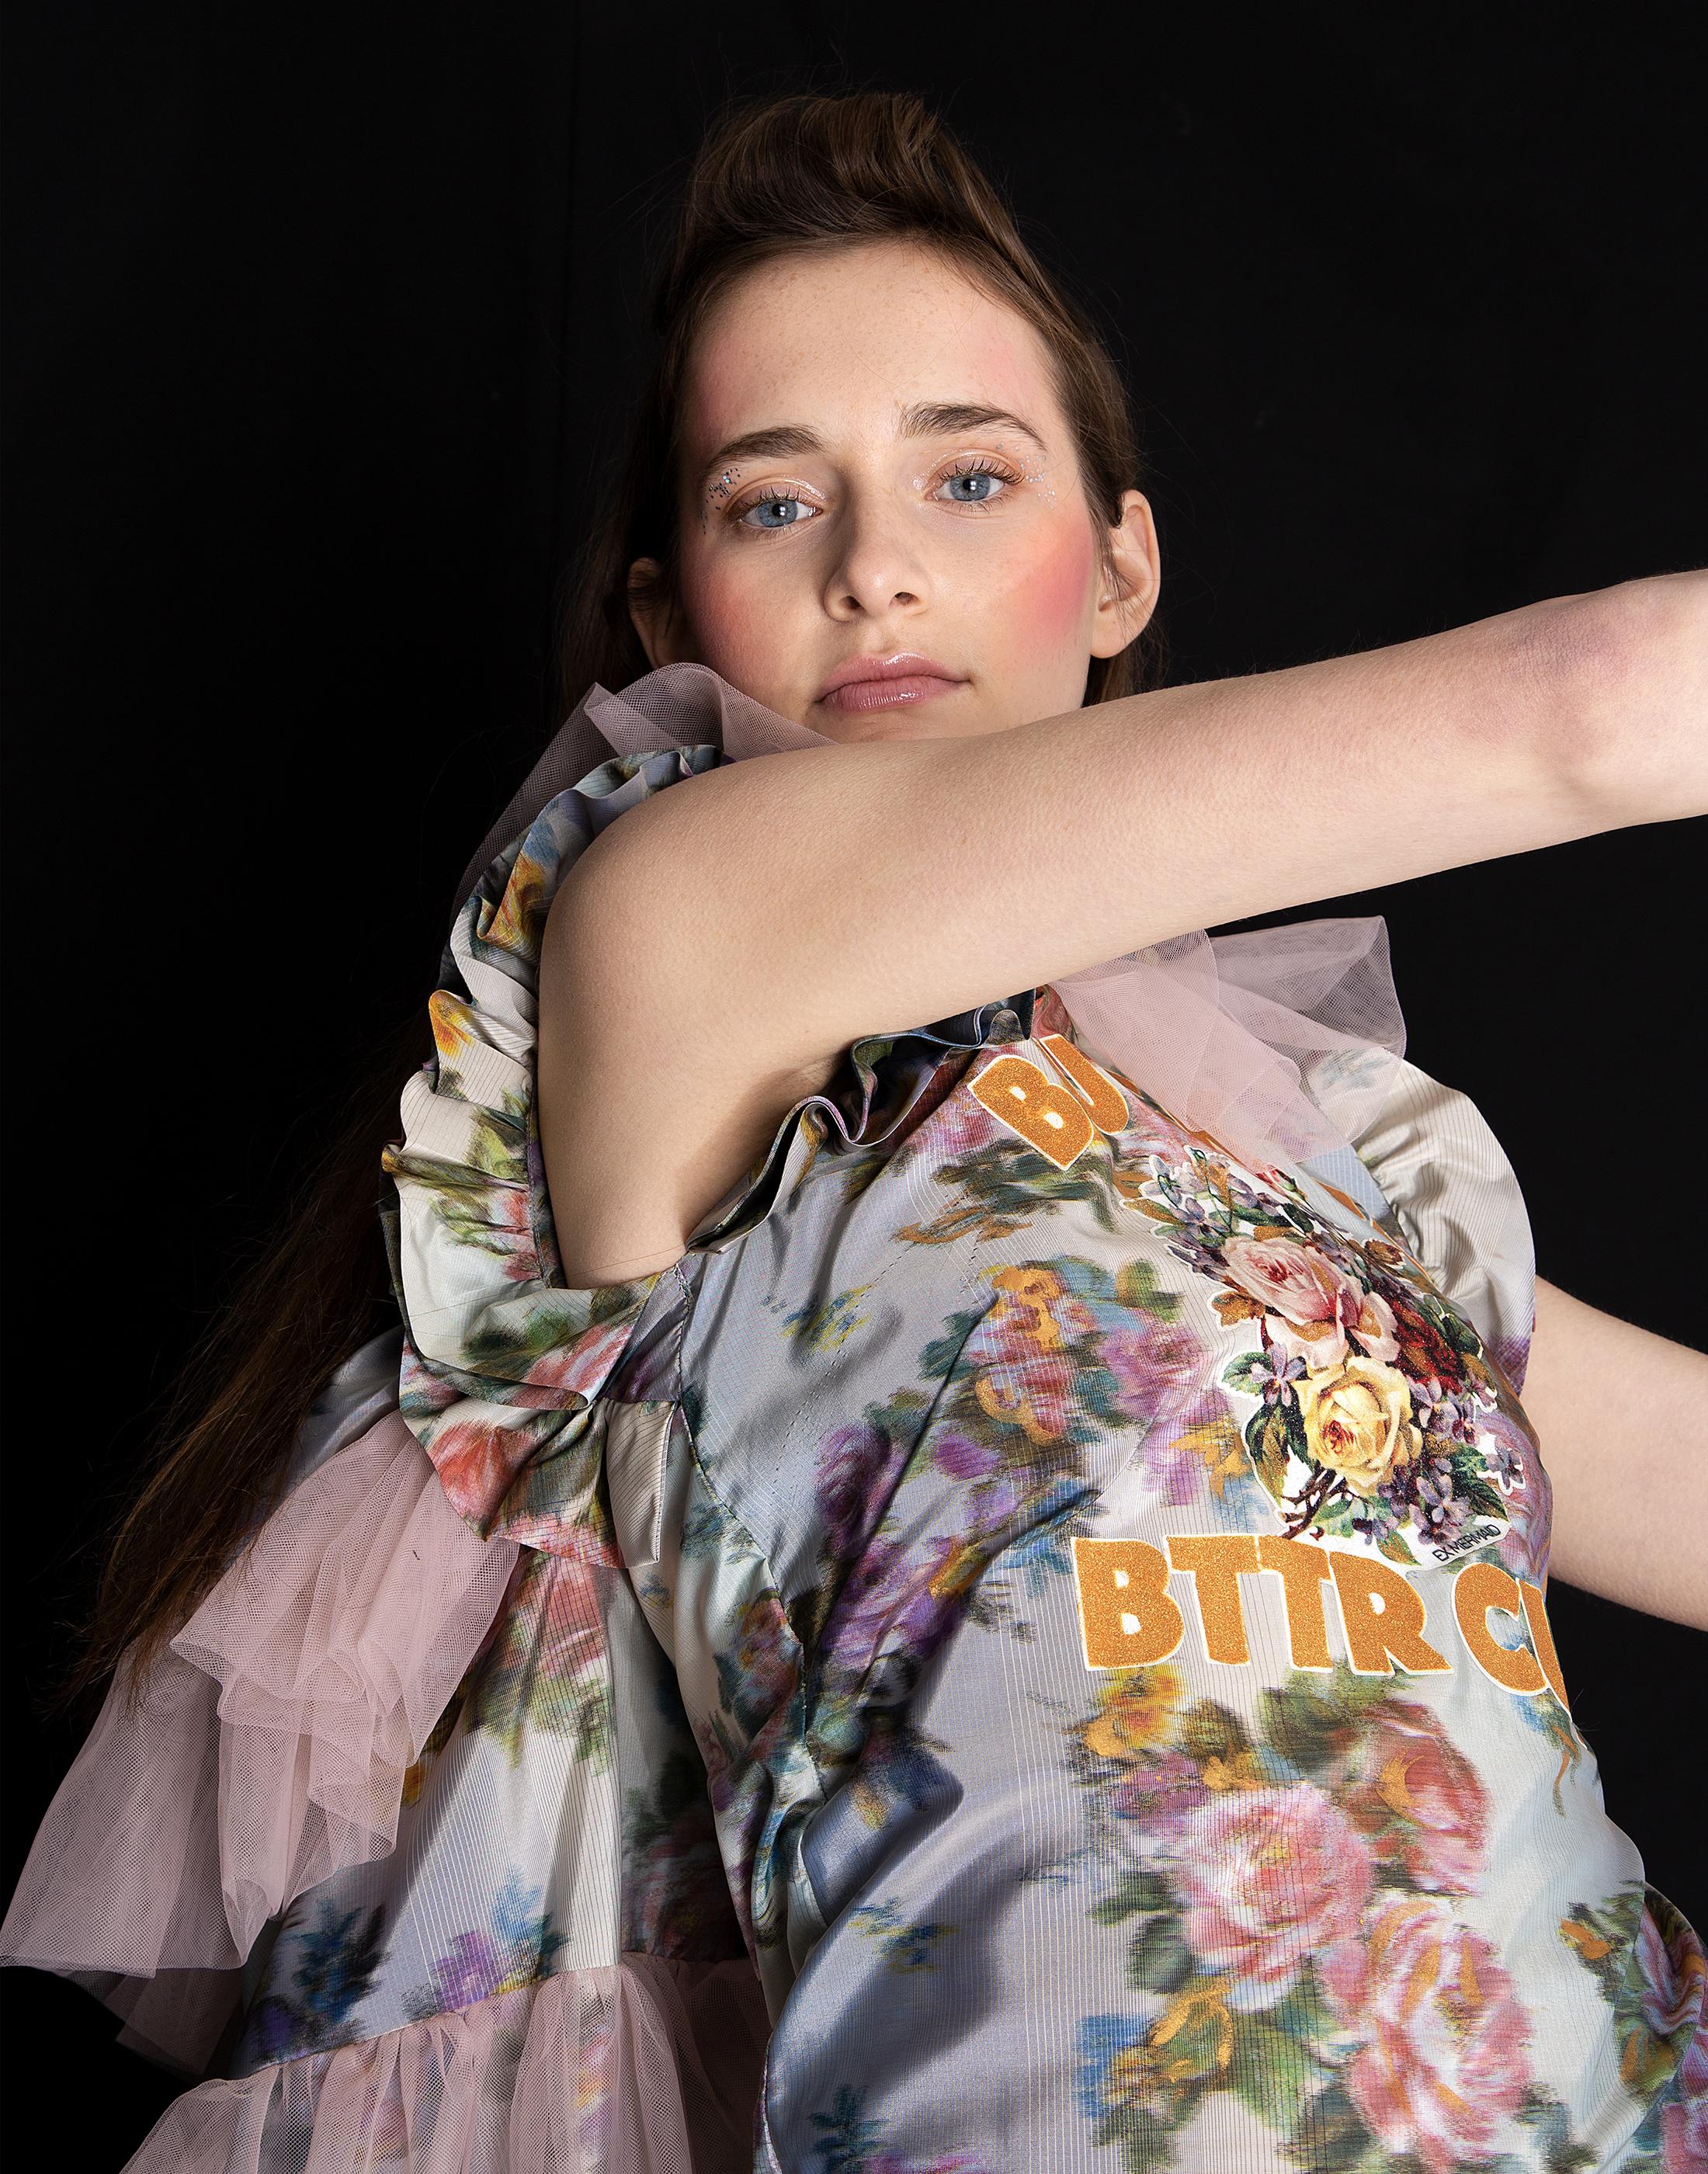 Kitsch Princess   Published on 11 March 2019   Photography + Art Direction  by Jae Eun Seok @jaeoninsta   Stylist  Maki Maruko @maruko_maki   MakeUp + Hair  by Ta Ming Chen @tamingchen   Model  Paige Hurle @paige_hurle @statemgmt